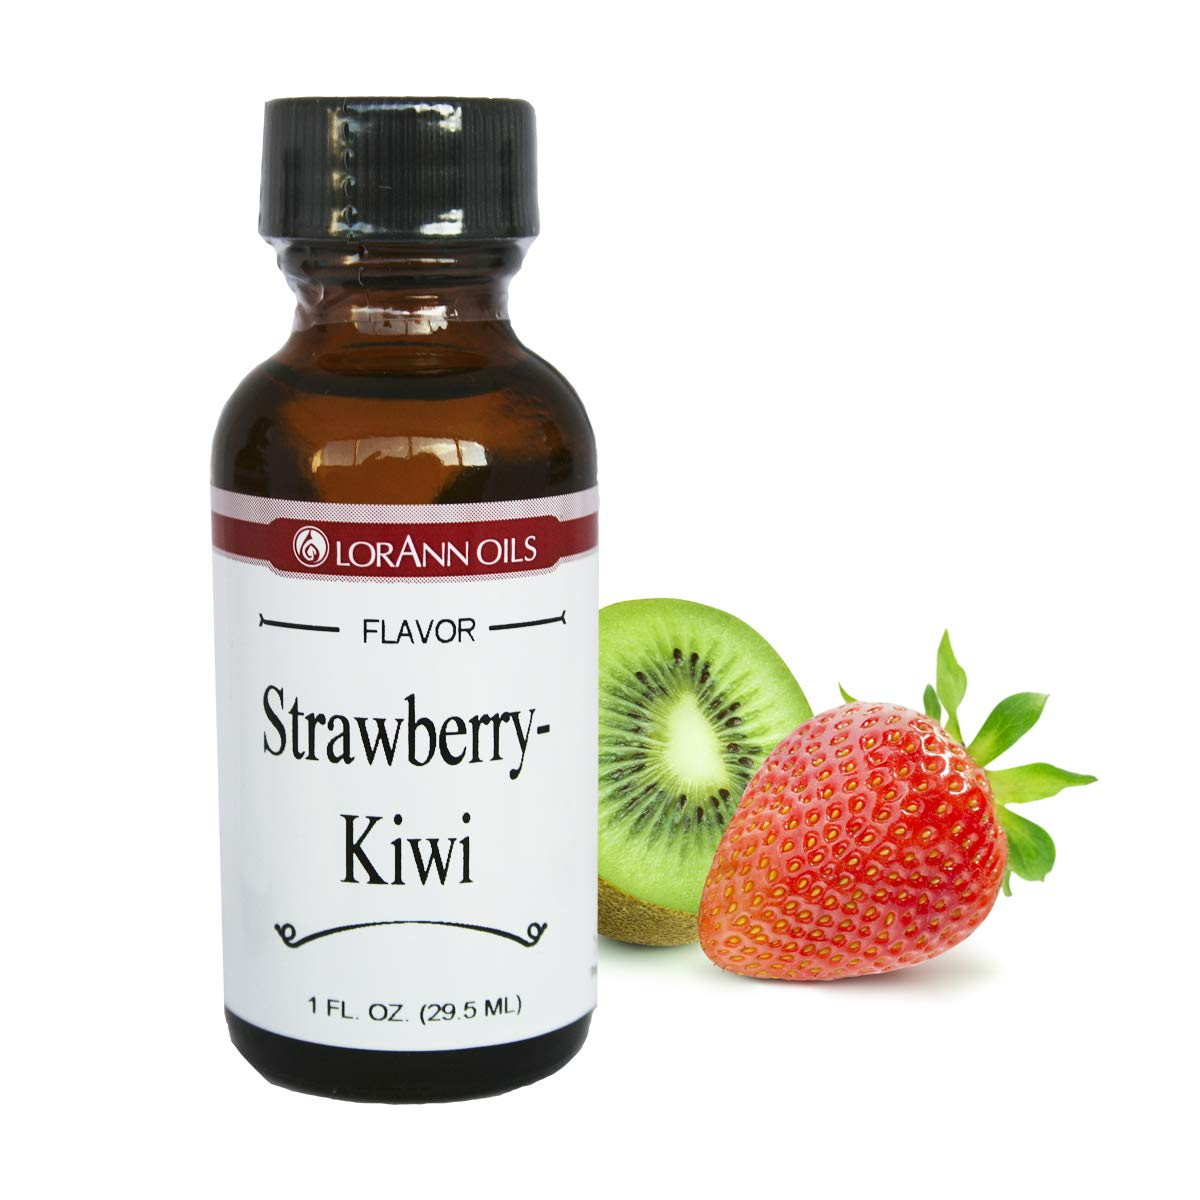 LorAnn Super Strength Strawberry-Kiwi flavor , 1 once bottle